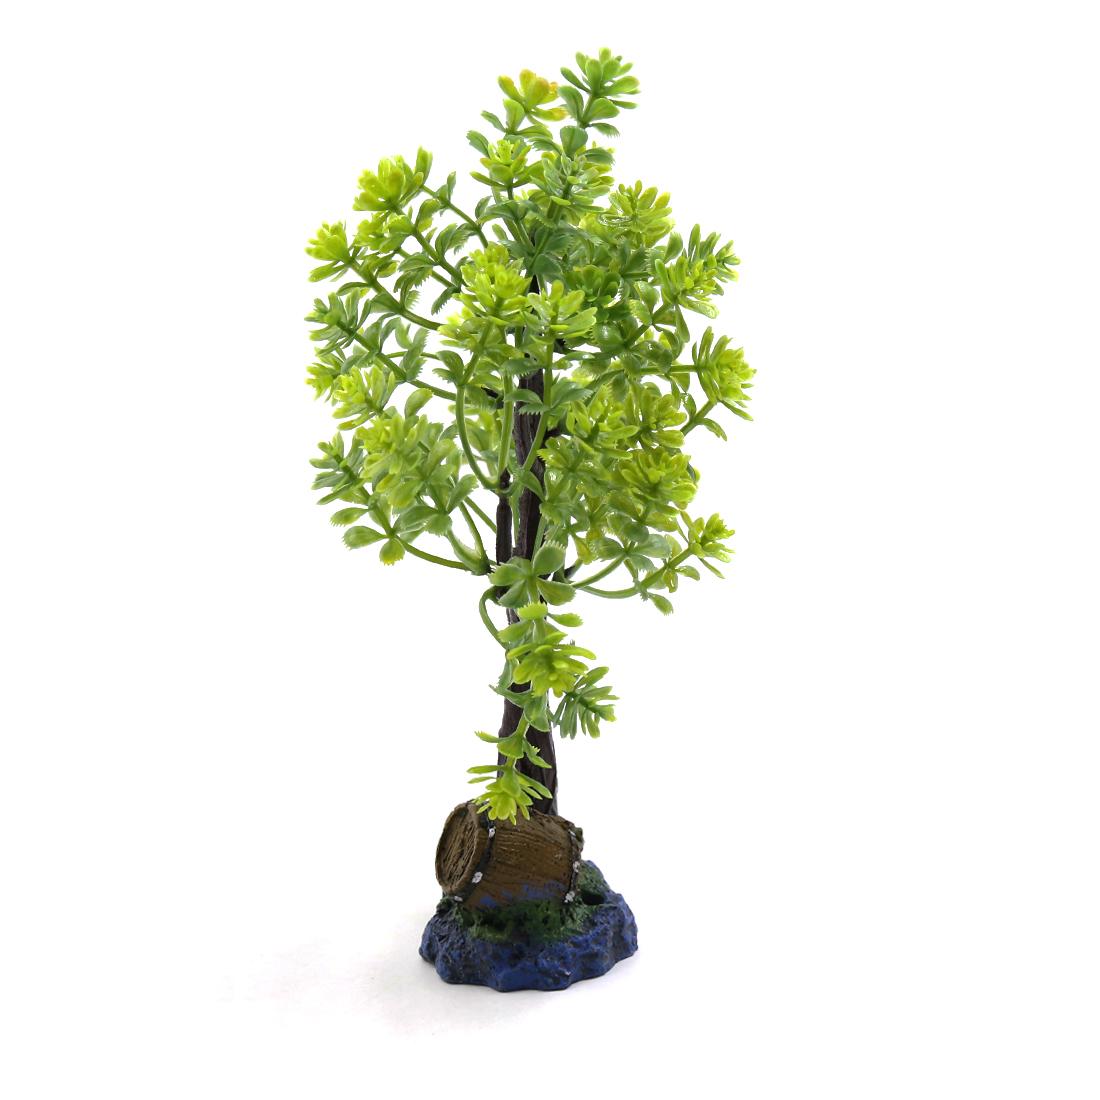 Green Plastic Tree Fishbowl Aquarium Decorative Plant Waterscape Decor w/ Stand - image 1 de 3